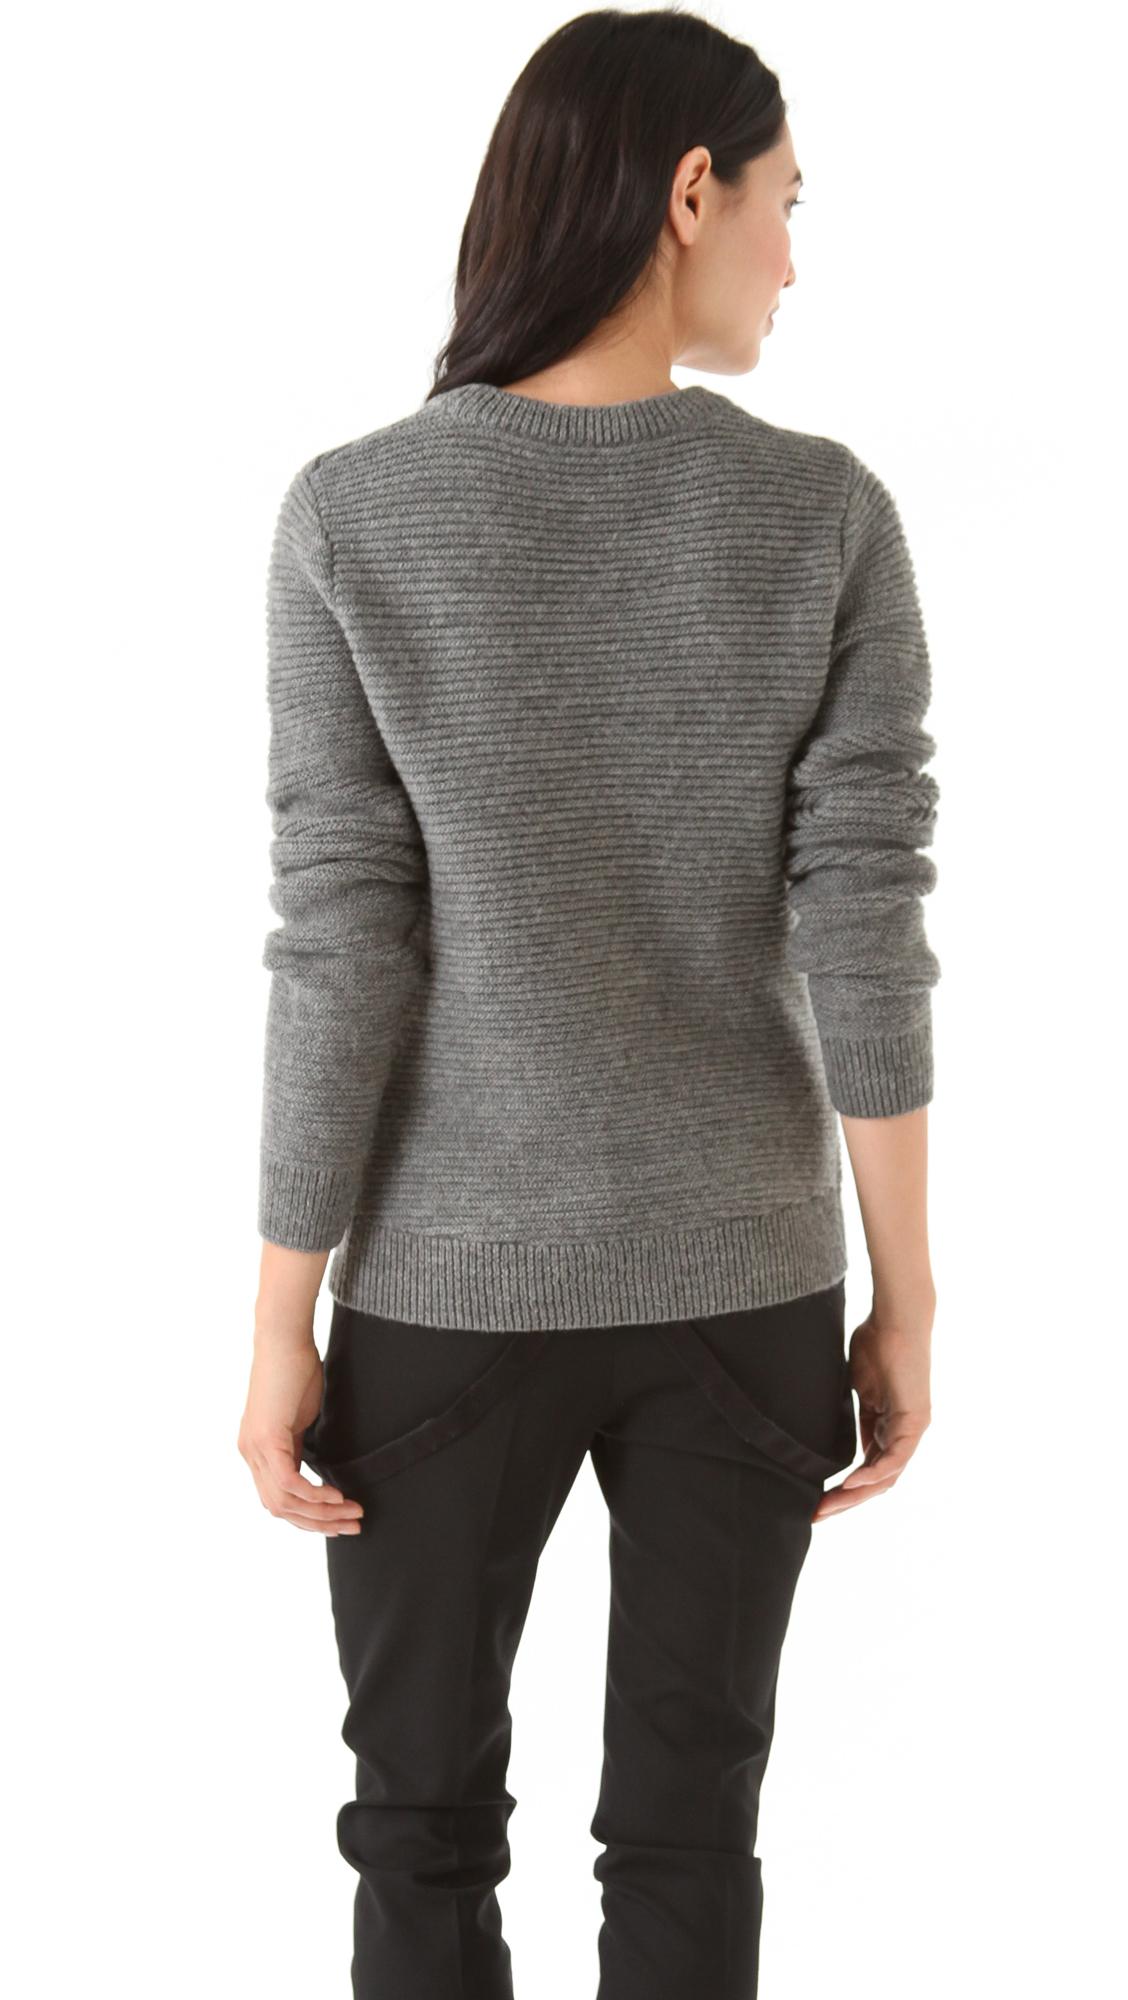 Lyst - A.L.C. Van Sweater in Gray